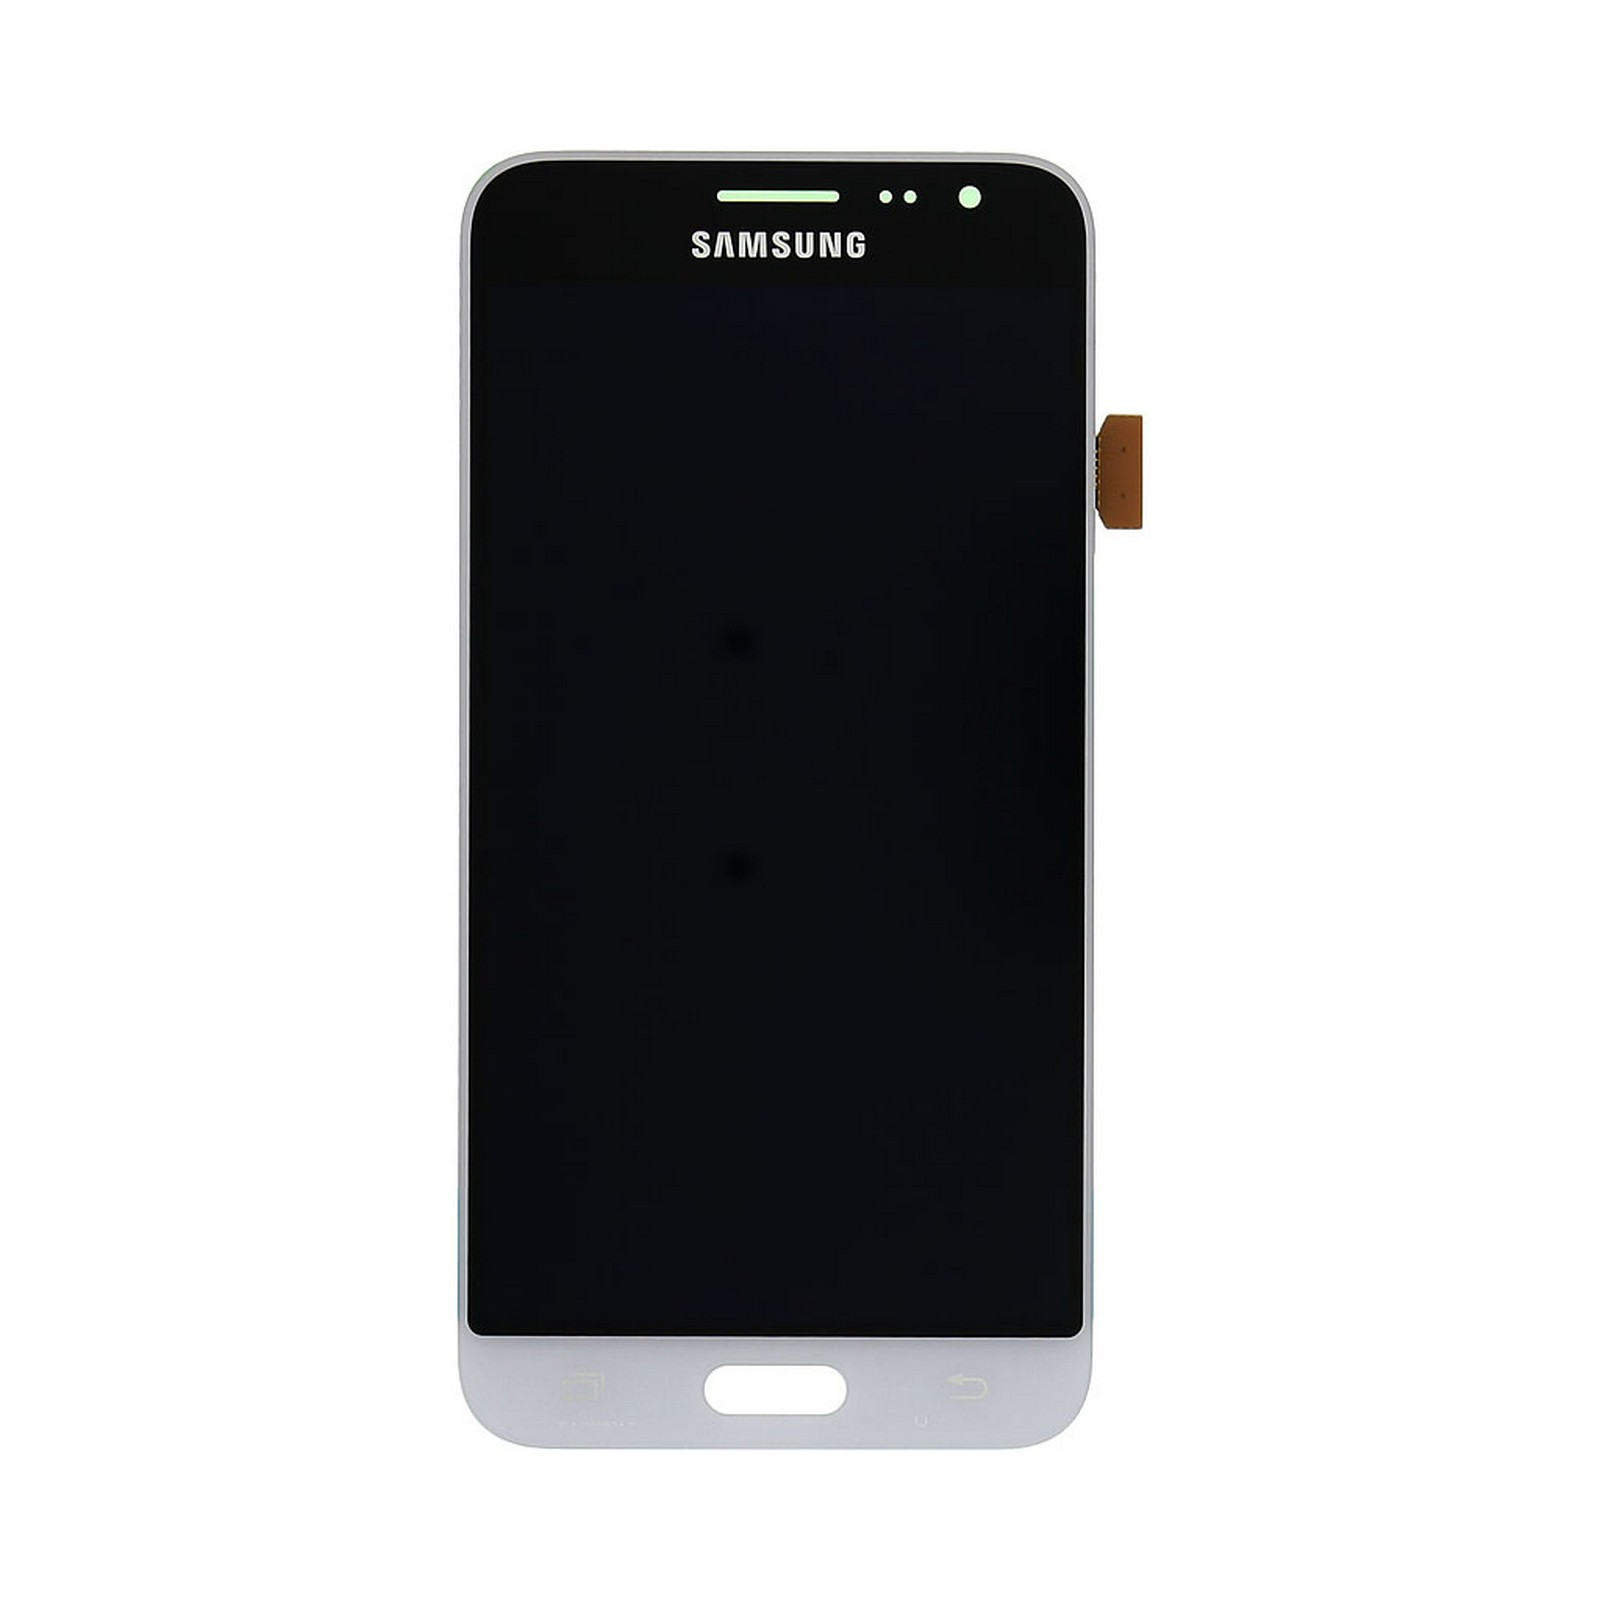 display lcd touch screen originale samsung galaxy j3 2016 sm j320fn bianco ebay. Black Bedroom Furniture Sets. Home Design Ideas